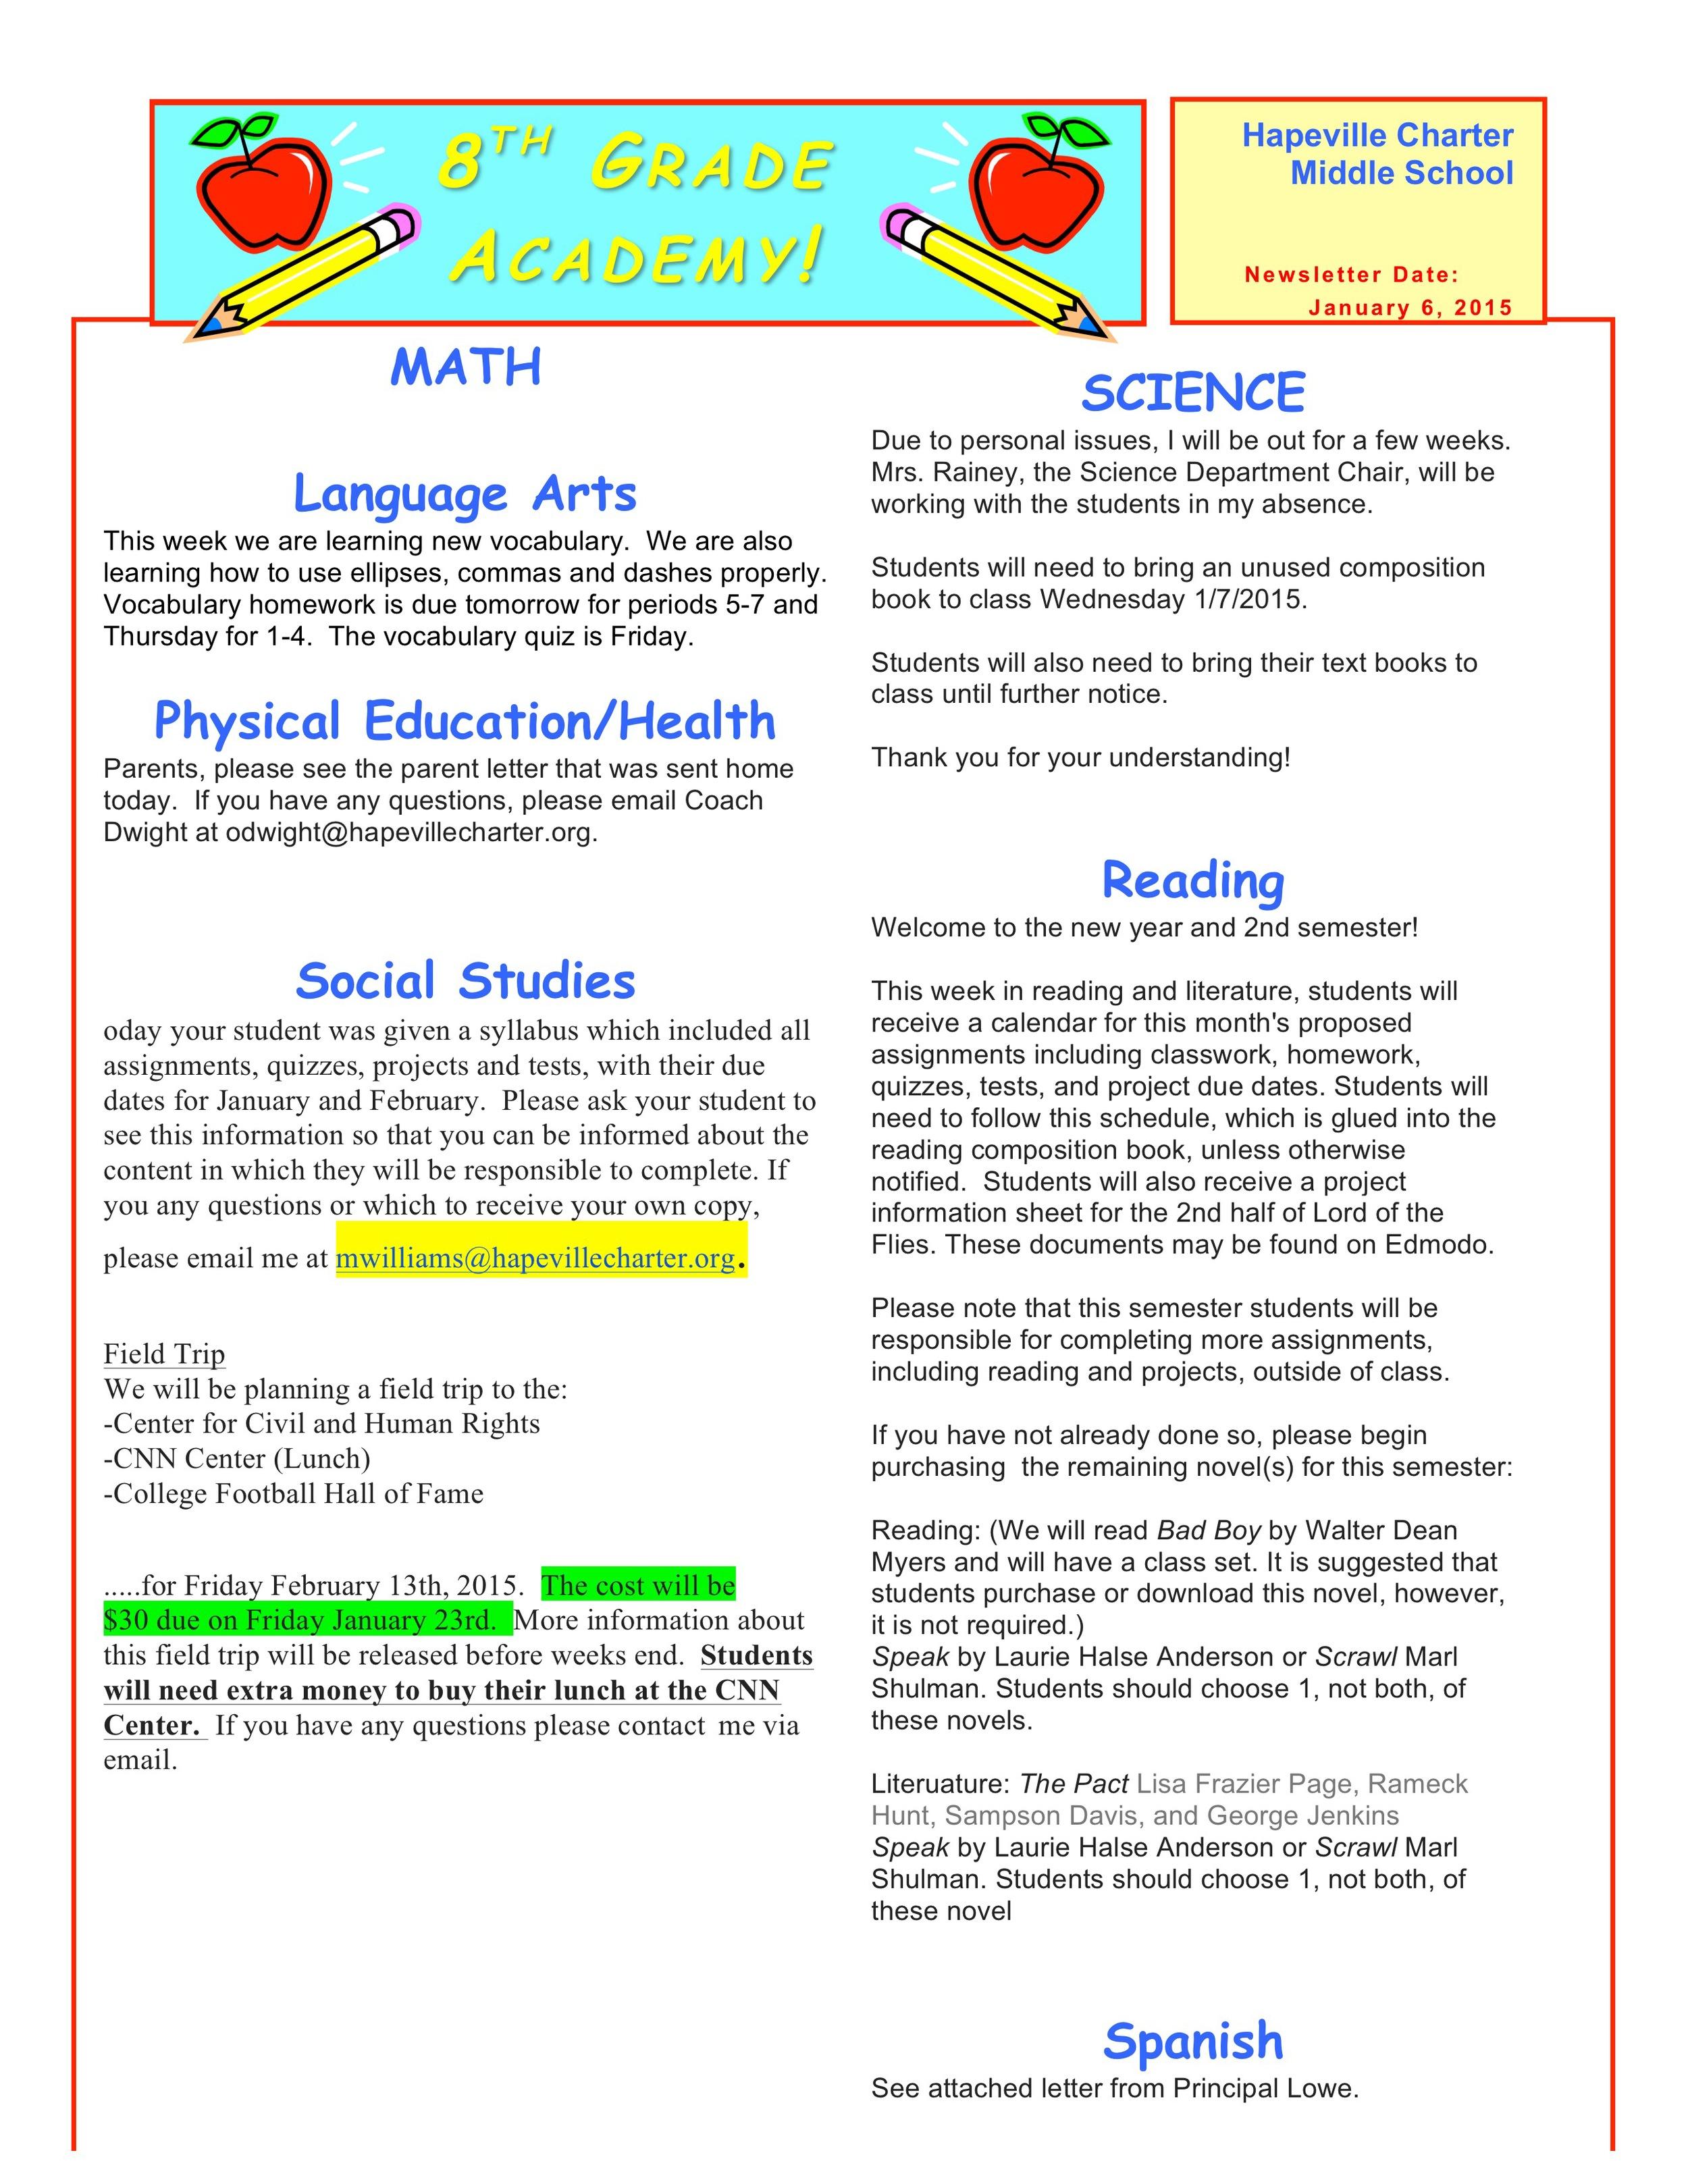 Newsletter Image8th grade January 6.jpeg